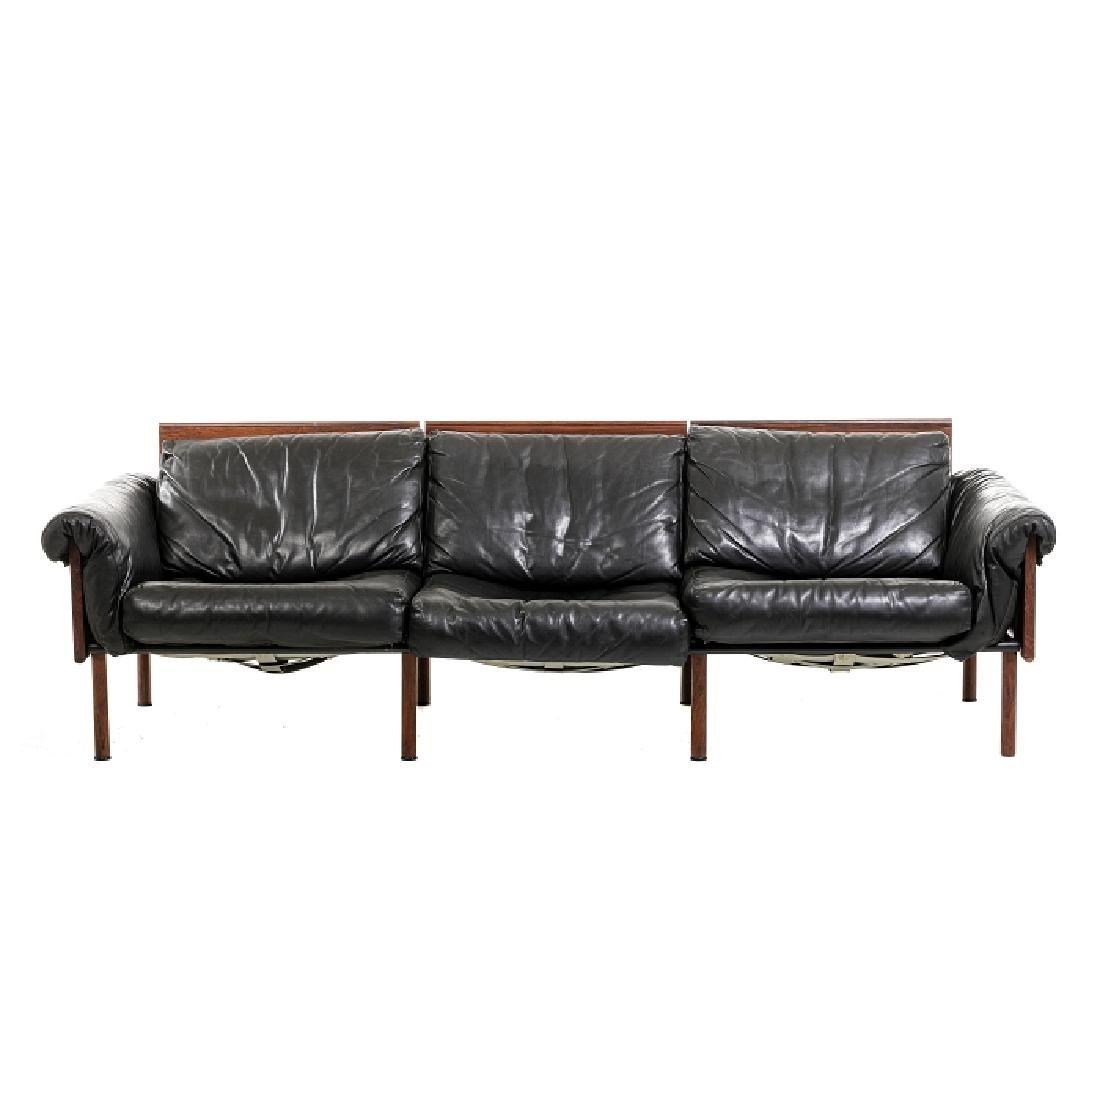 YRJO KUKKAPURO (b. 1933) - Three-seat Ateljee sofa